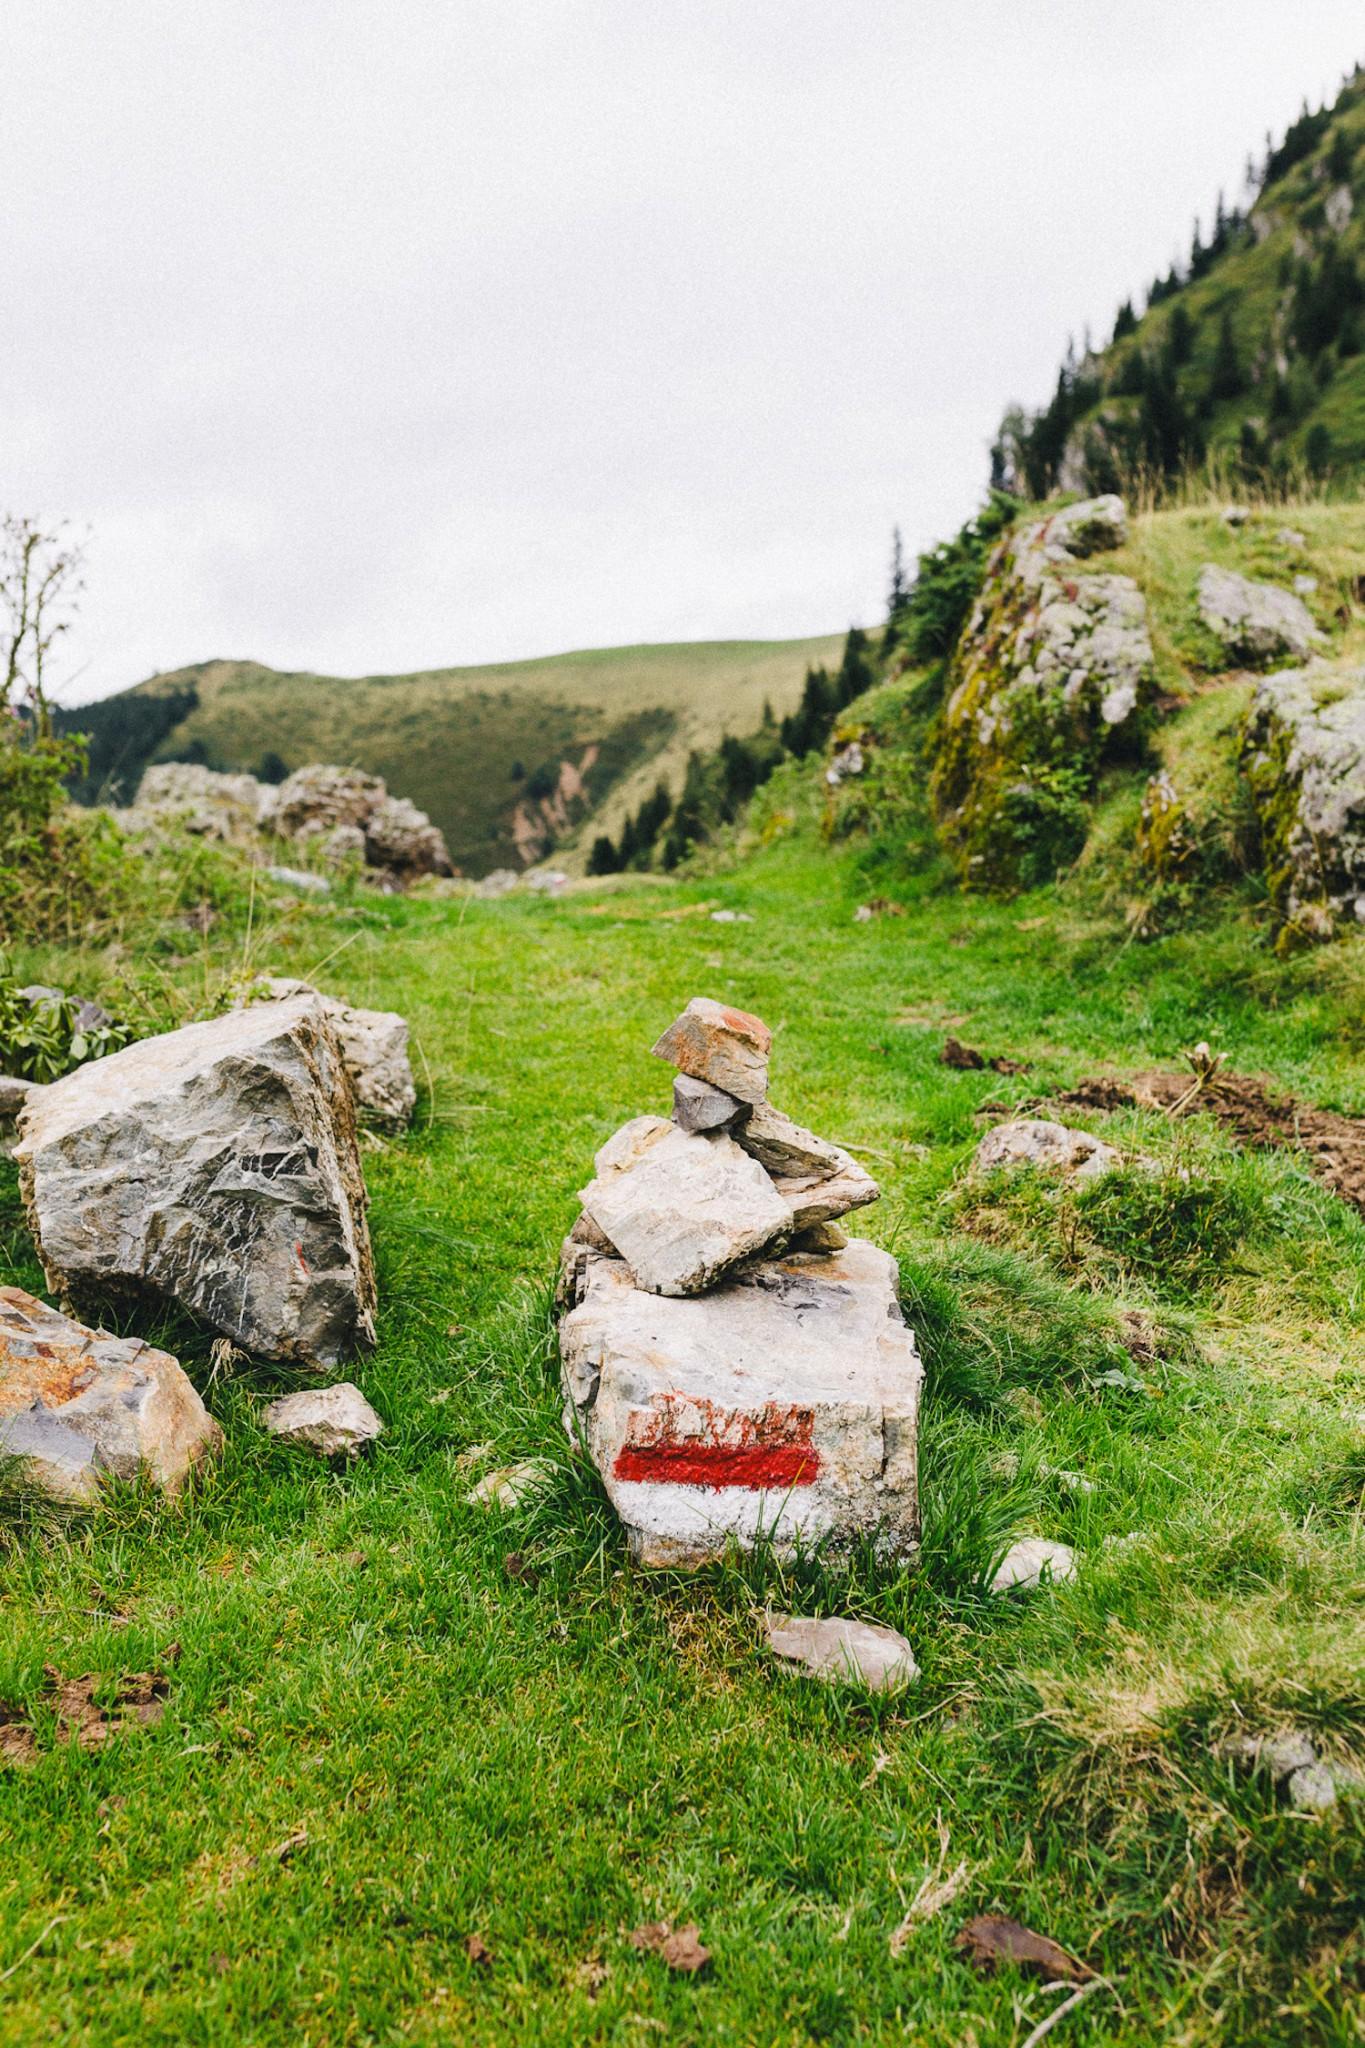 randonnee-au-lac-d-ayes-pyrenees-ariegeoises-rose-fushia-photographie127